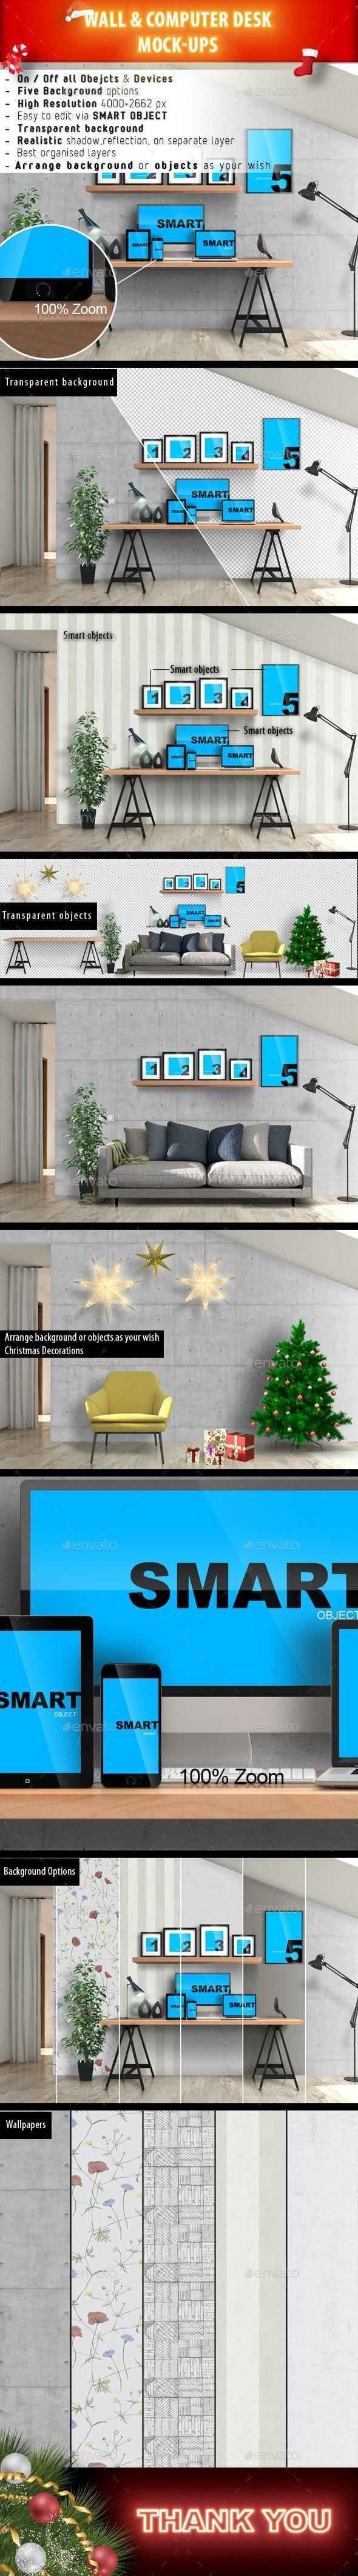 Wall & Computer Desk Mock-Ups - Product Mock-Ups Graphics